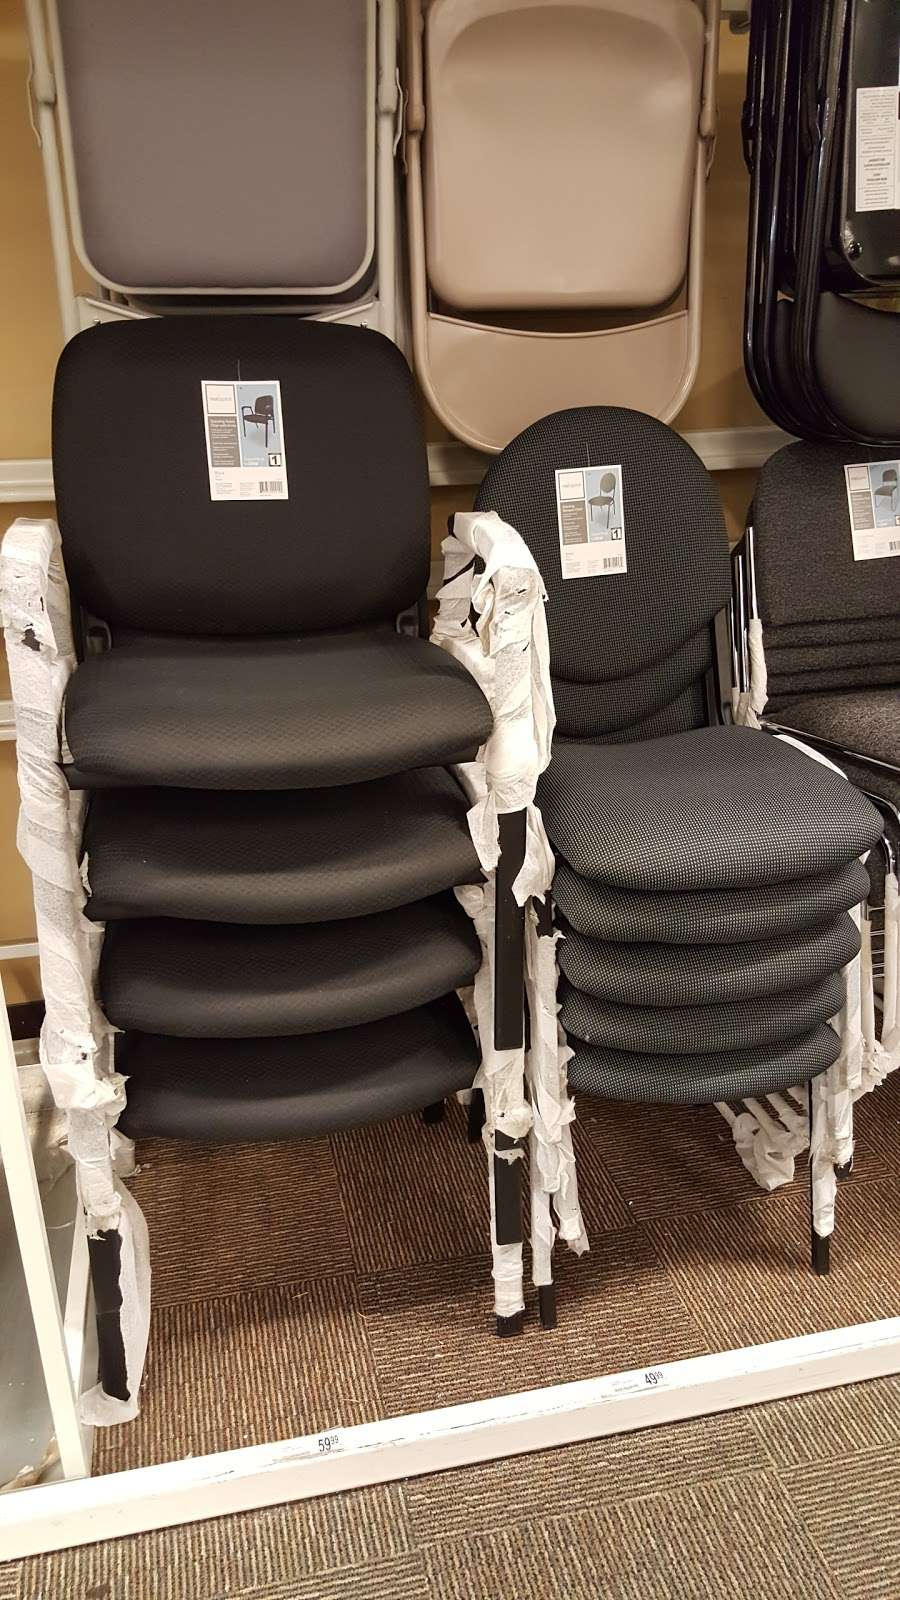 Office Depot - furniture store  | Photo 7 of 10 | Address: 4615 Garth Rd, Baytown, TX 77521, USA | Phone: (281) 837-8101